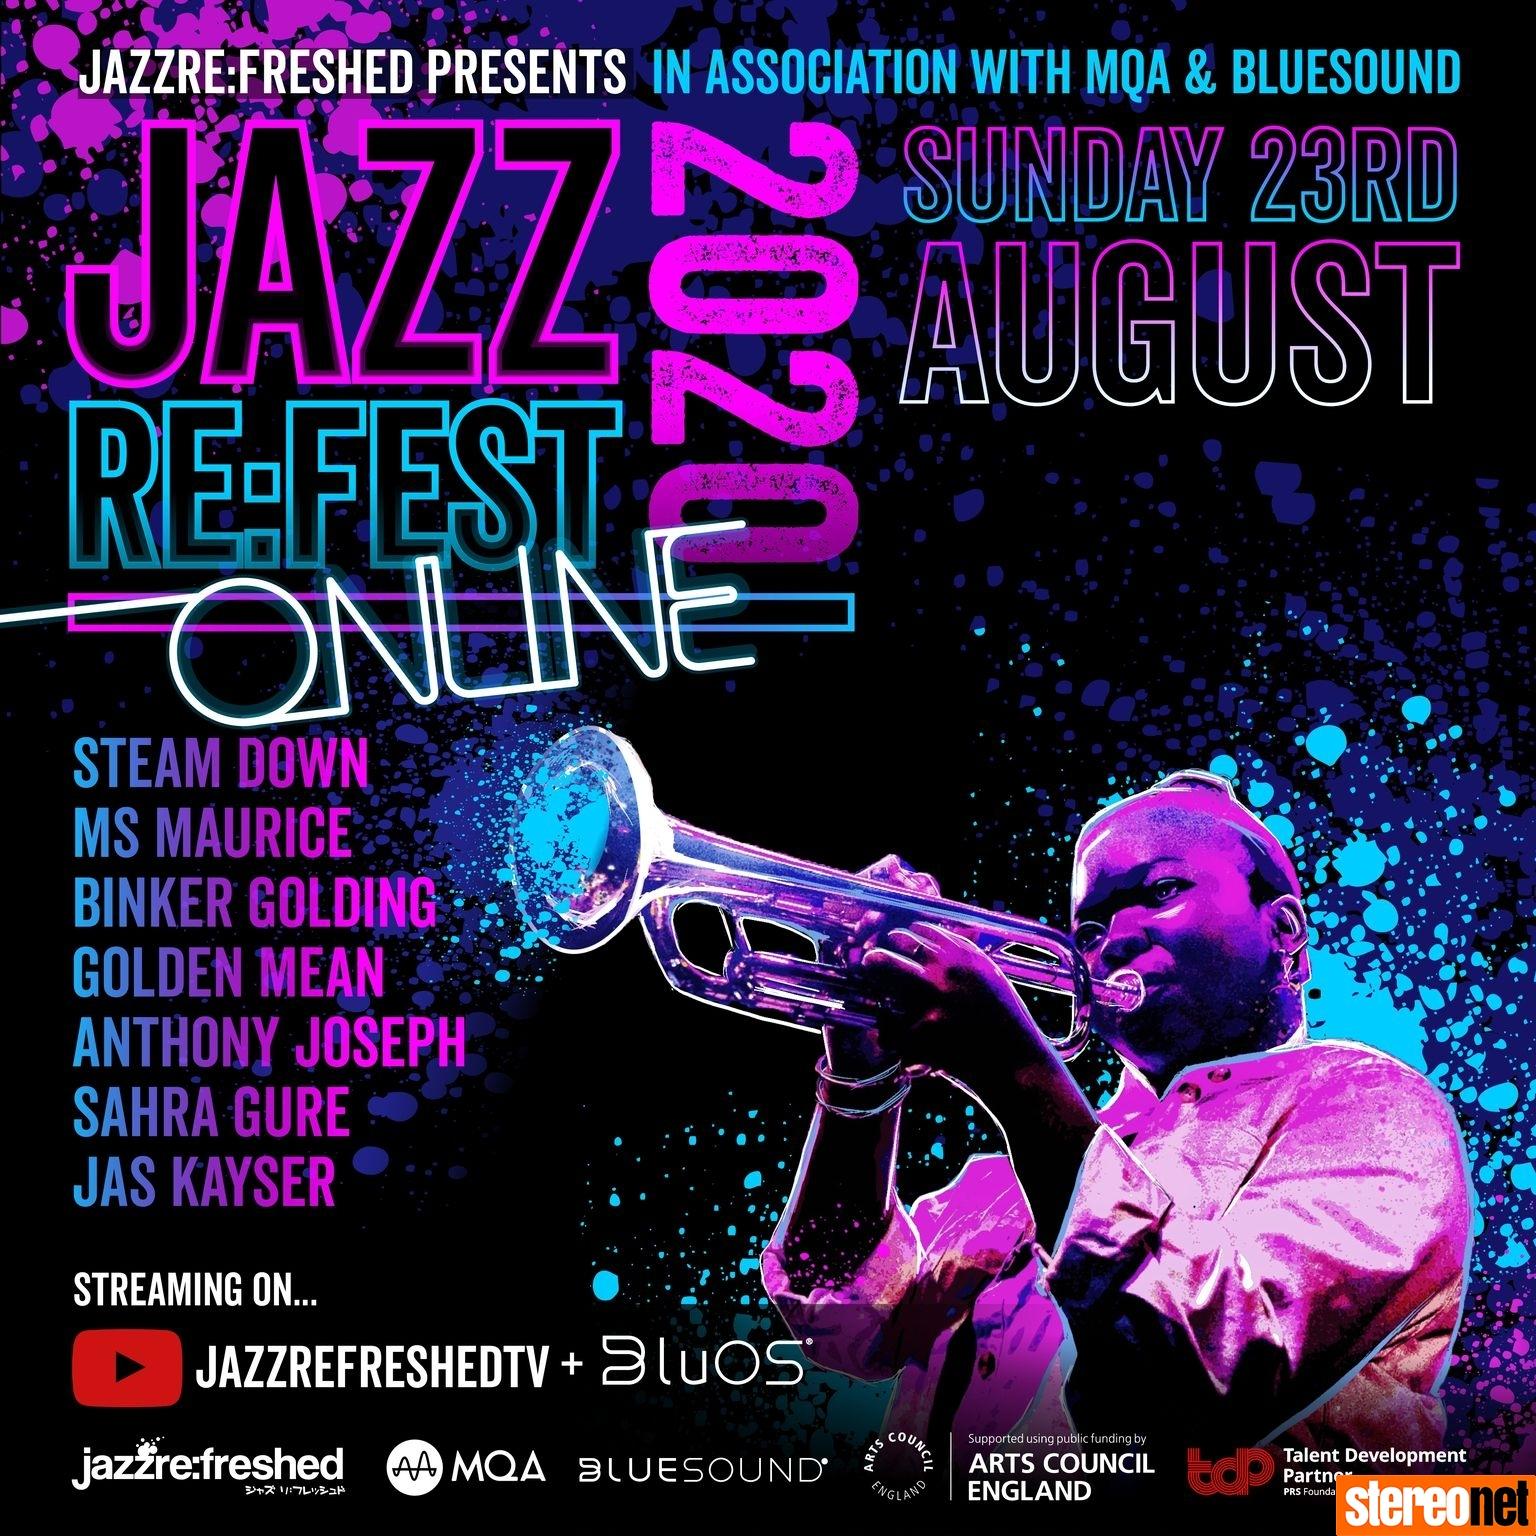 Jazz Re:Fest 2020 MQA and Bluesound BluOS